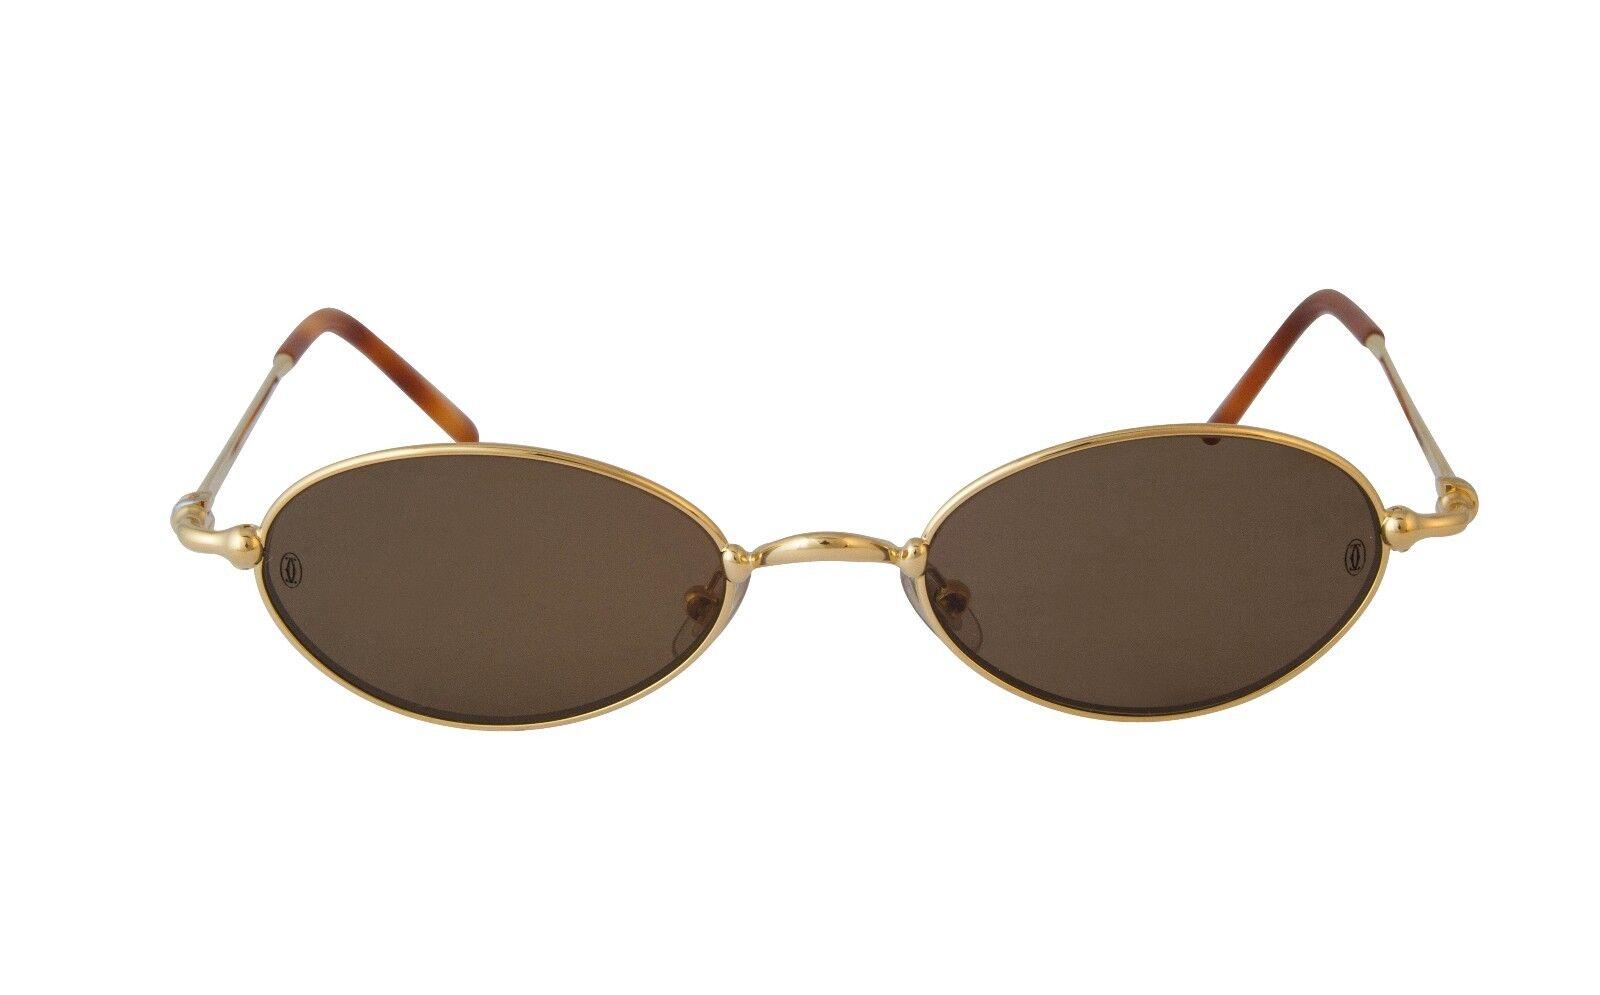 f53c7357a779 Cartier Sunglasses MIZ82PZ3 Gold Oval Frame Brown Lens France ...